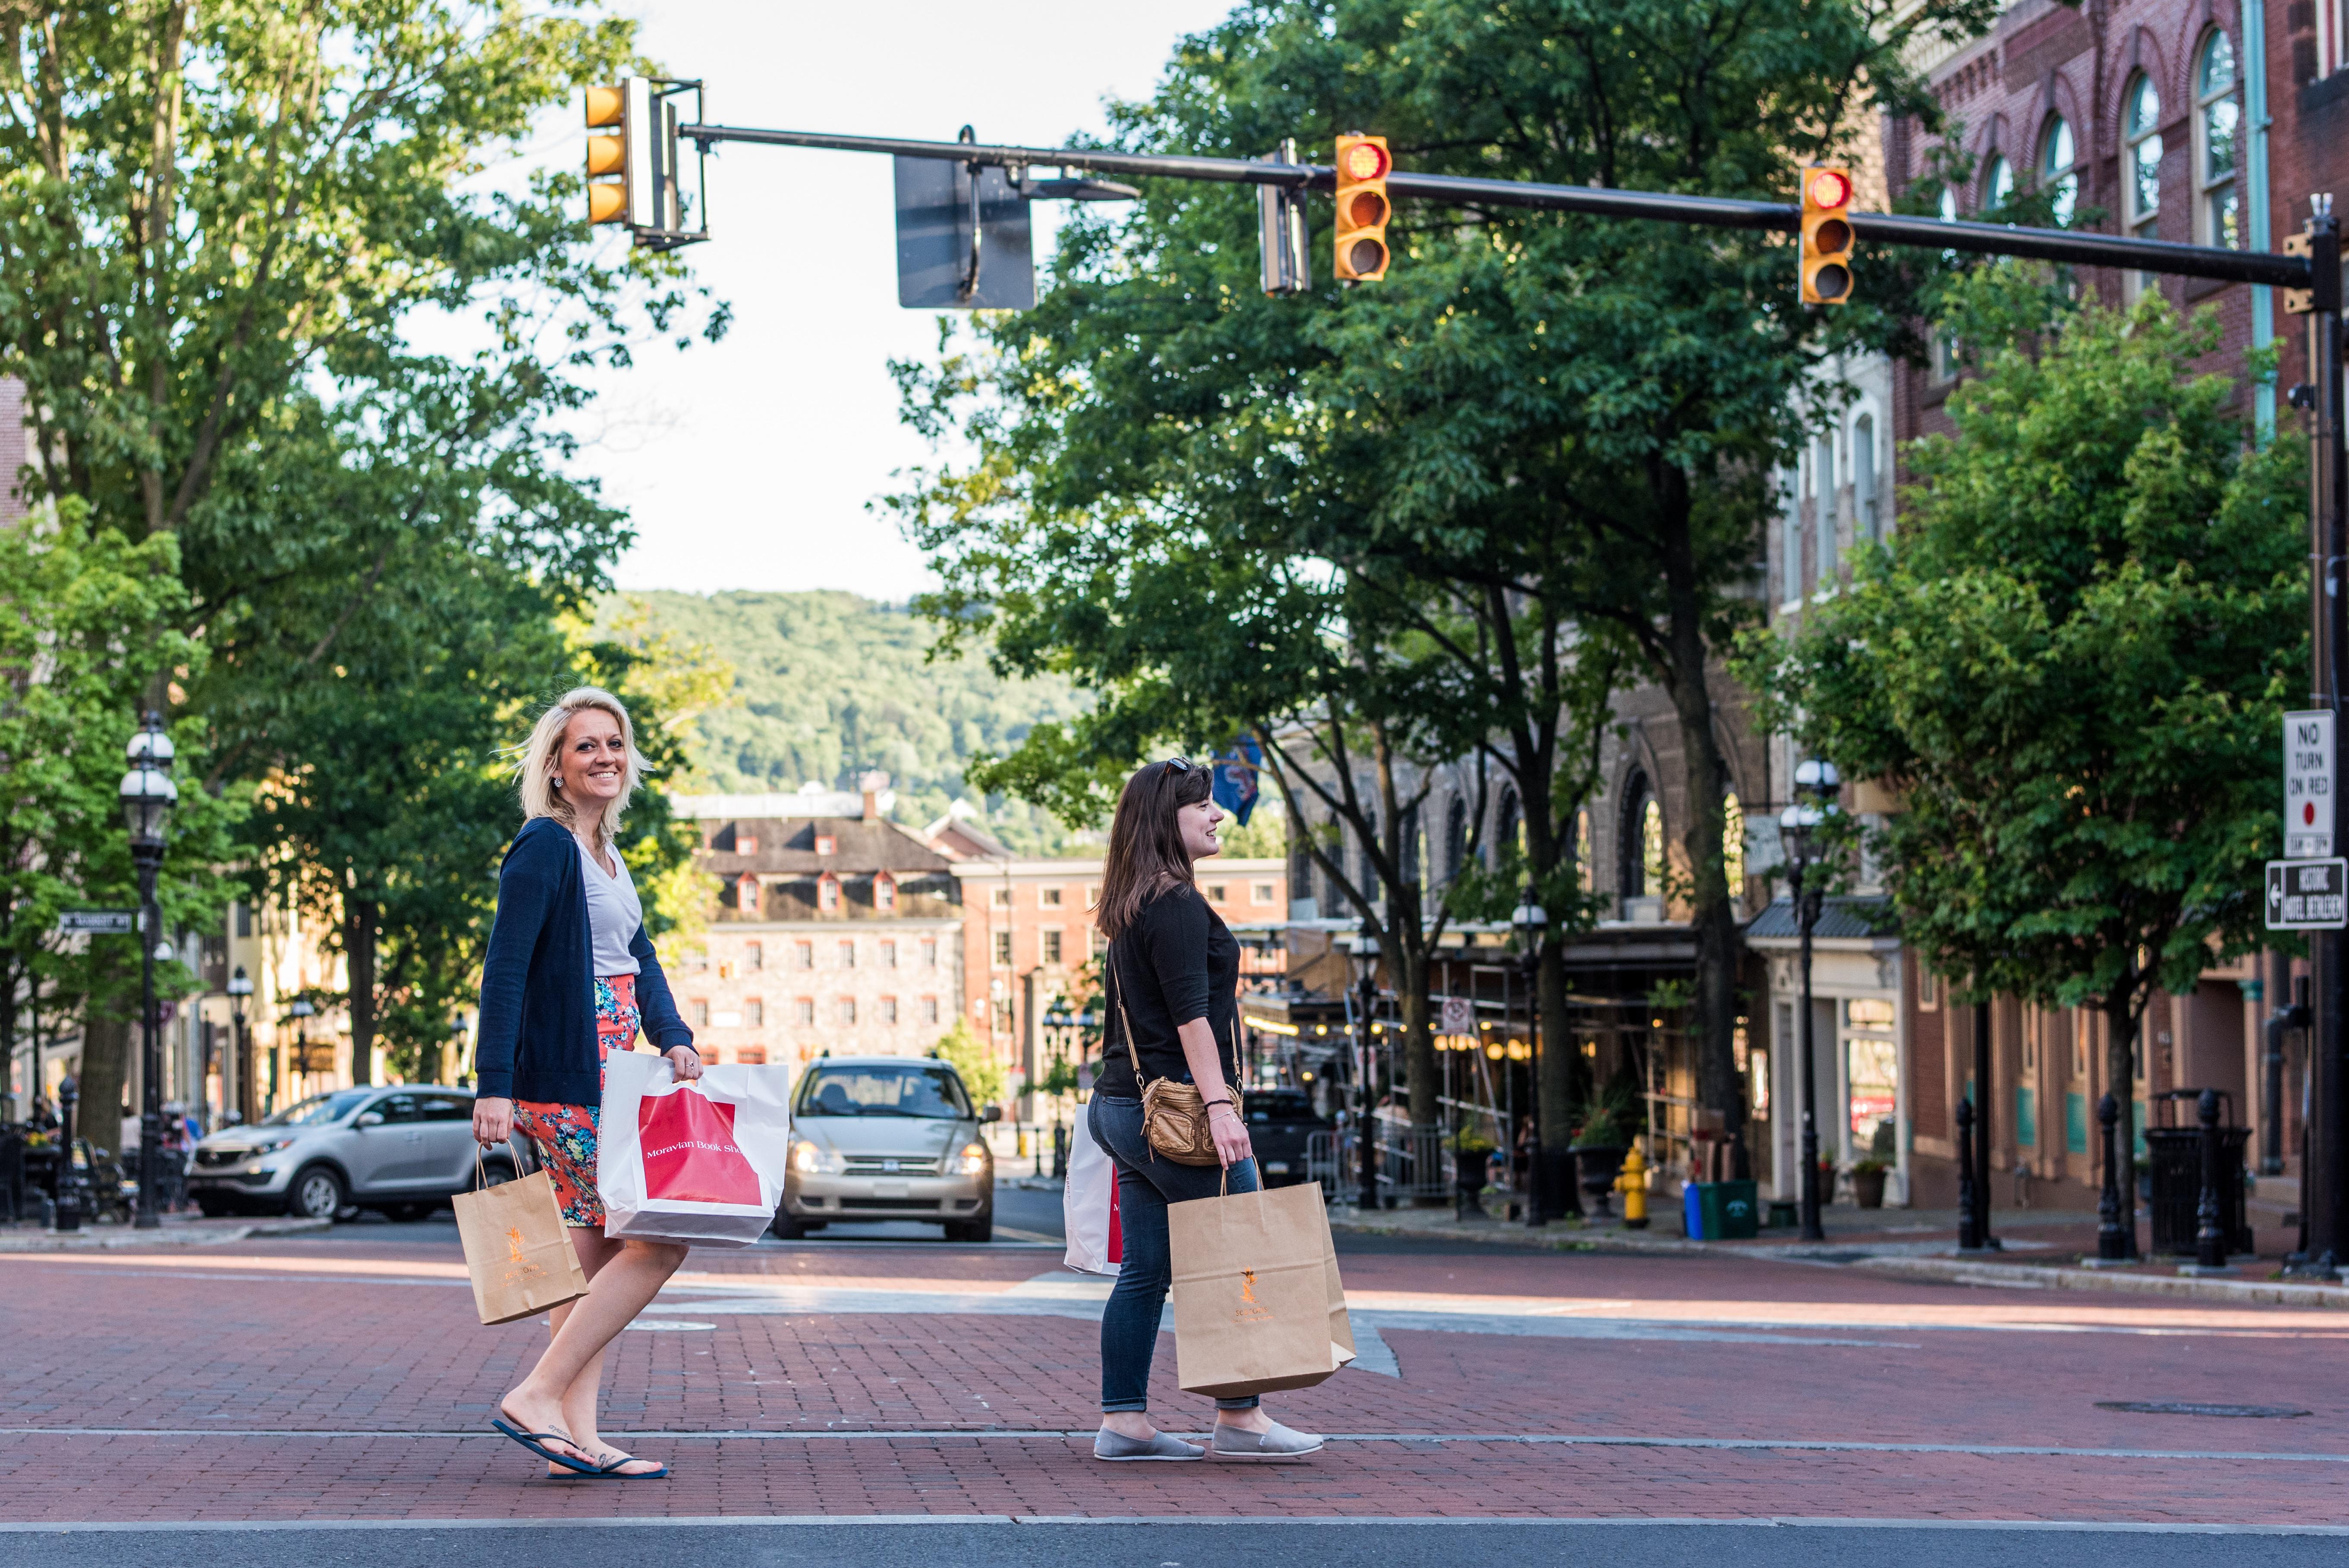 Discover Lehigh Valley | Allentown, Bethlehem & Easton